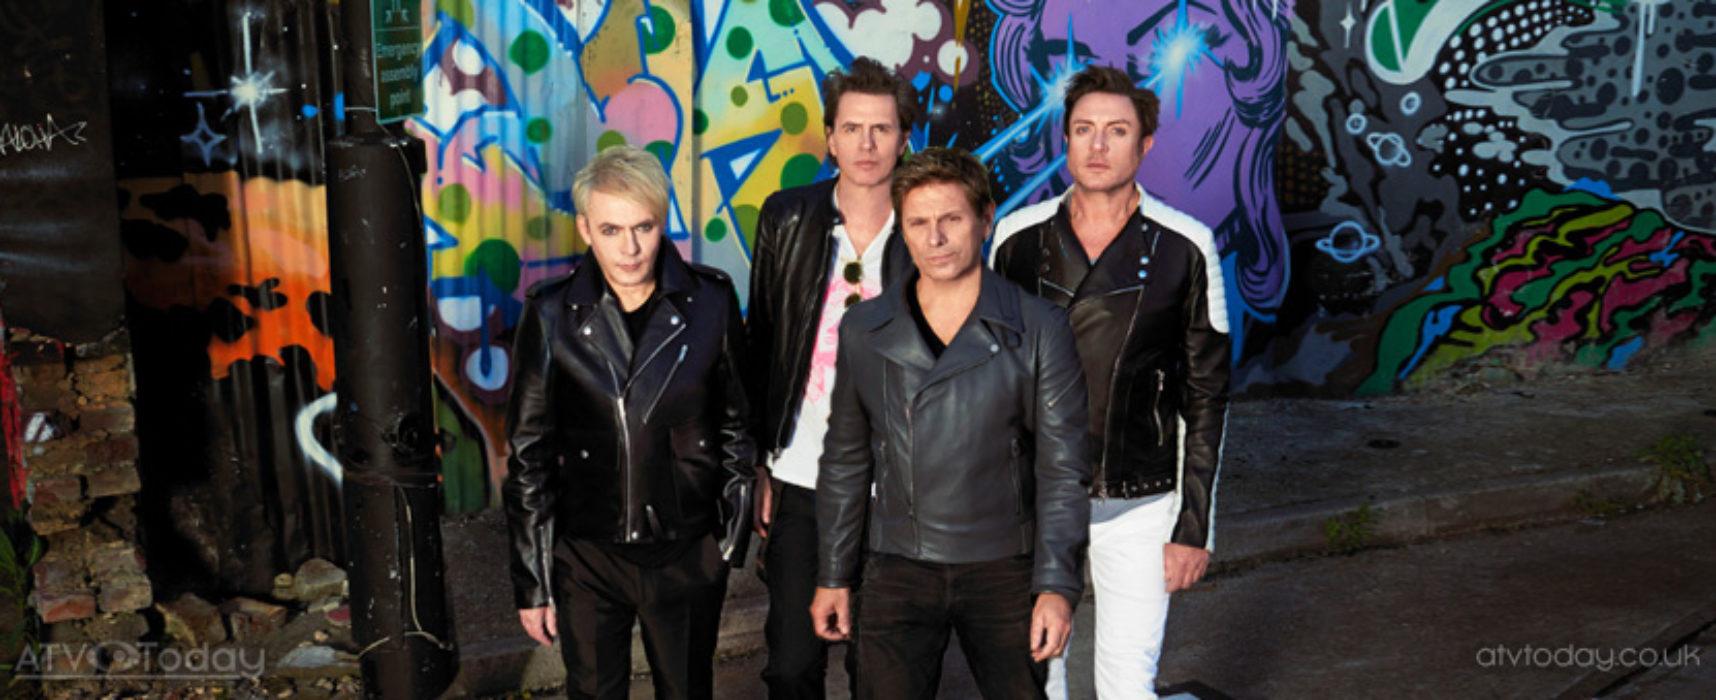 Duran Duran take over BBC Four for an evening